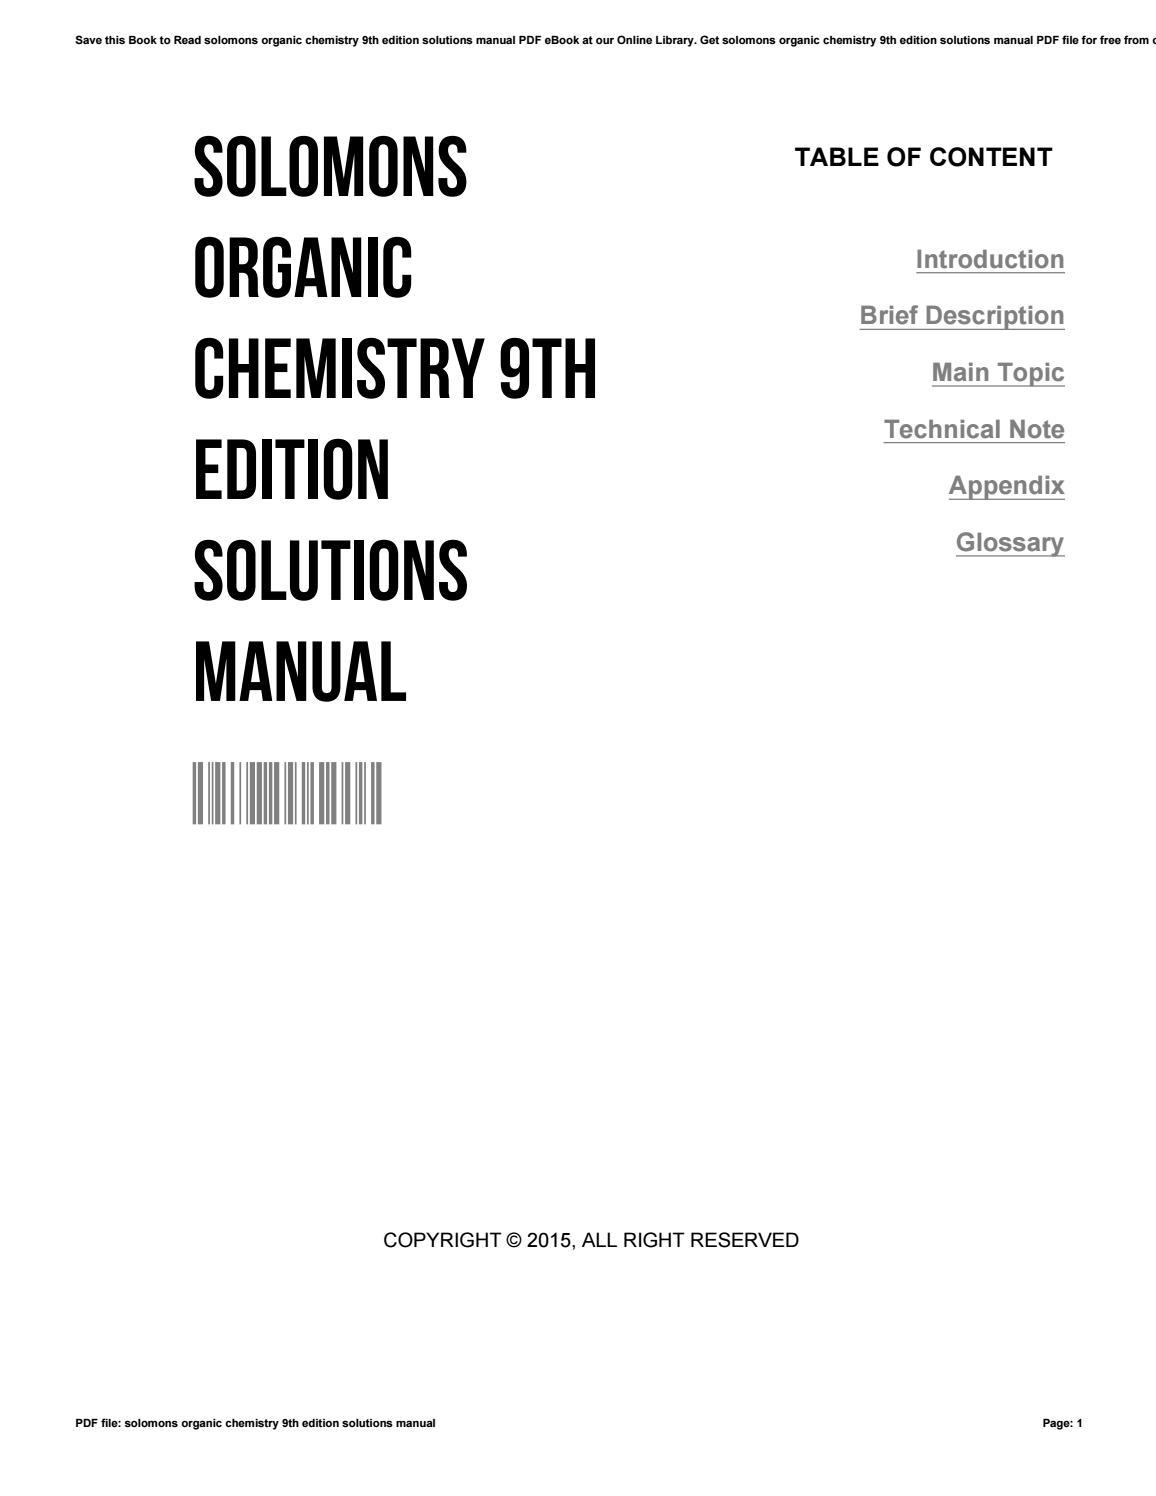 Solomons organic chemistry 9th edition solutions manual by EdwardBrown2524  - issuu